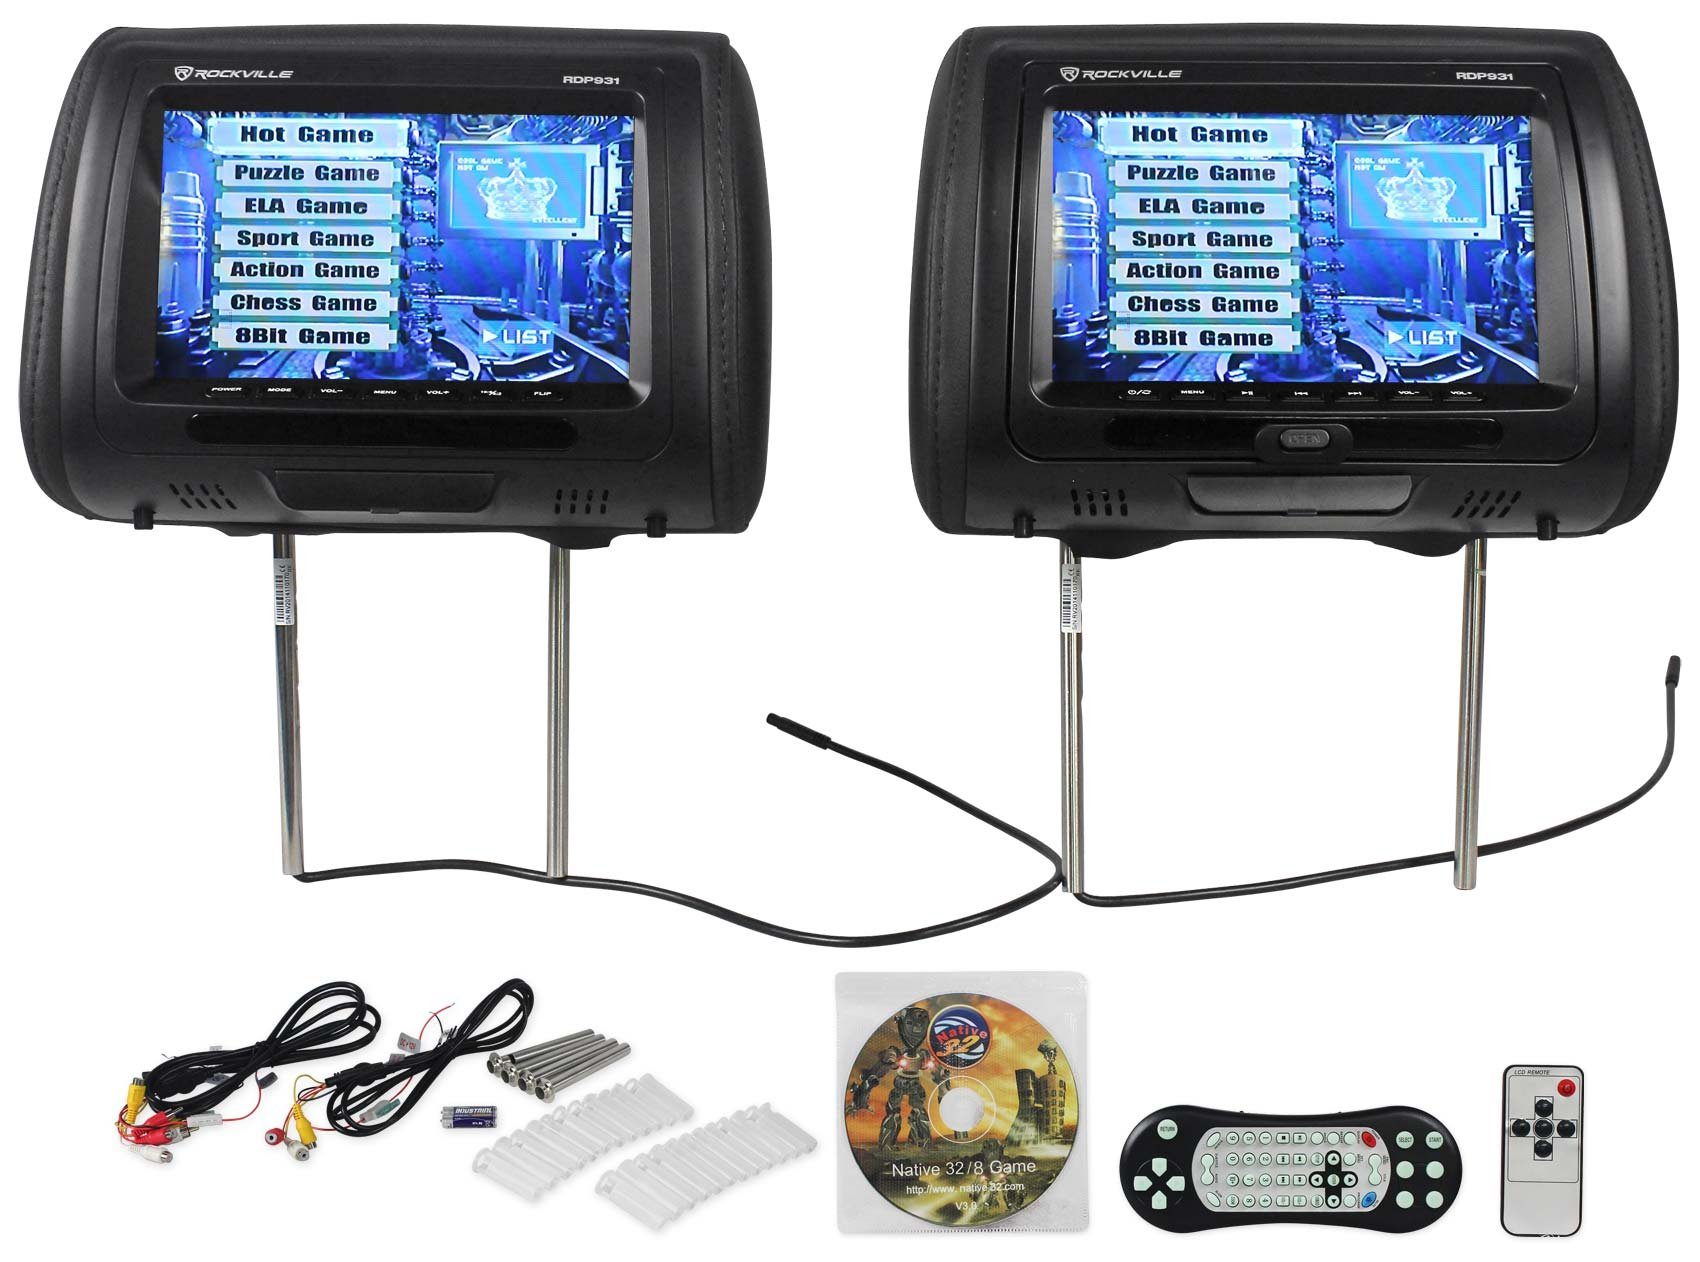 Rockville RDP931-BK 9'' Black Car DVD/USB/HDMI Headrest Monitors+Video Games by Rockville